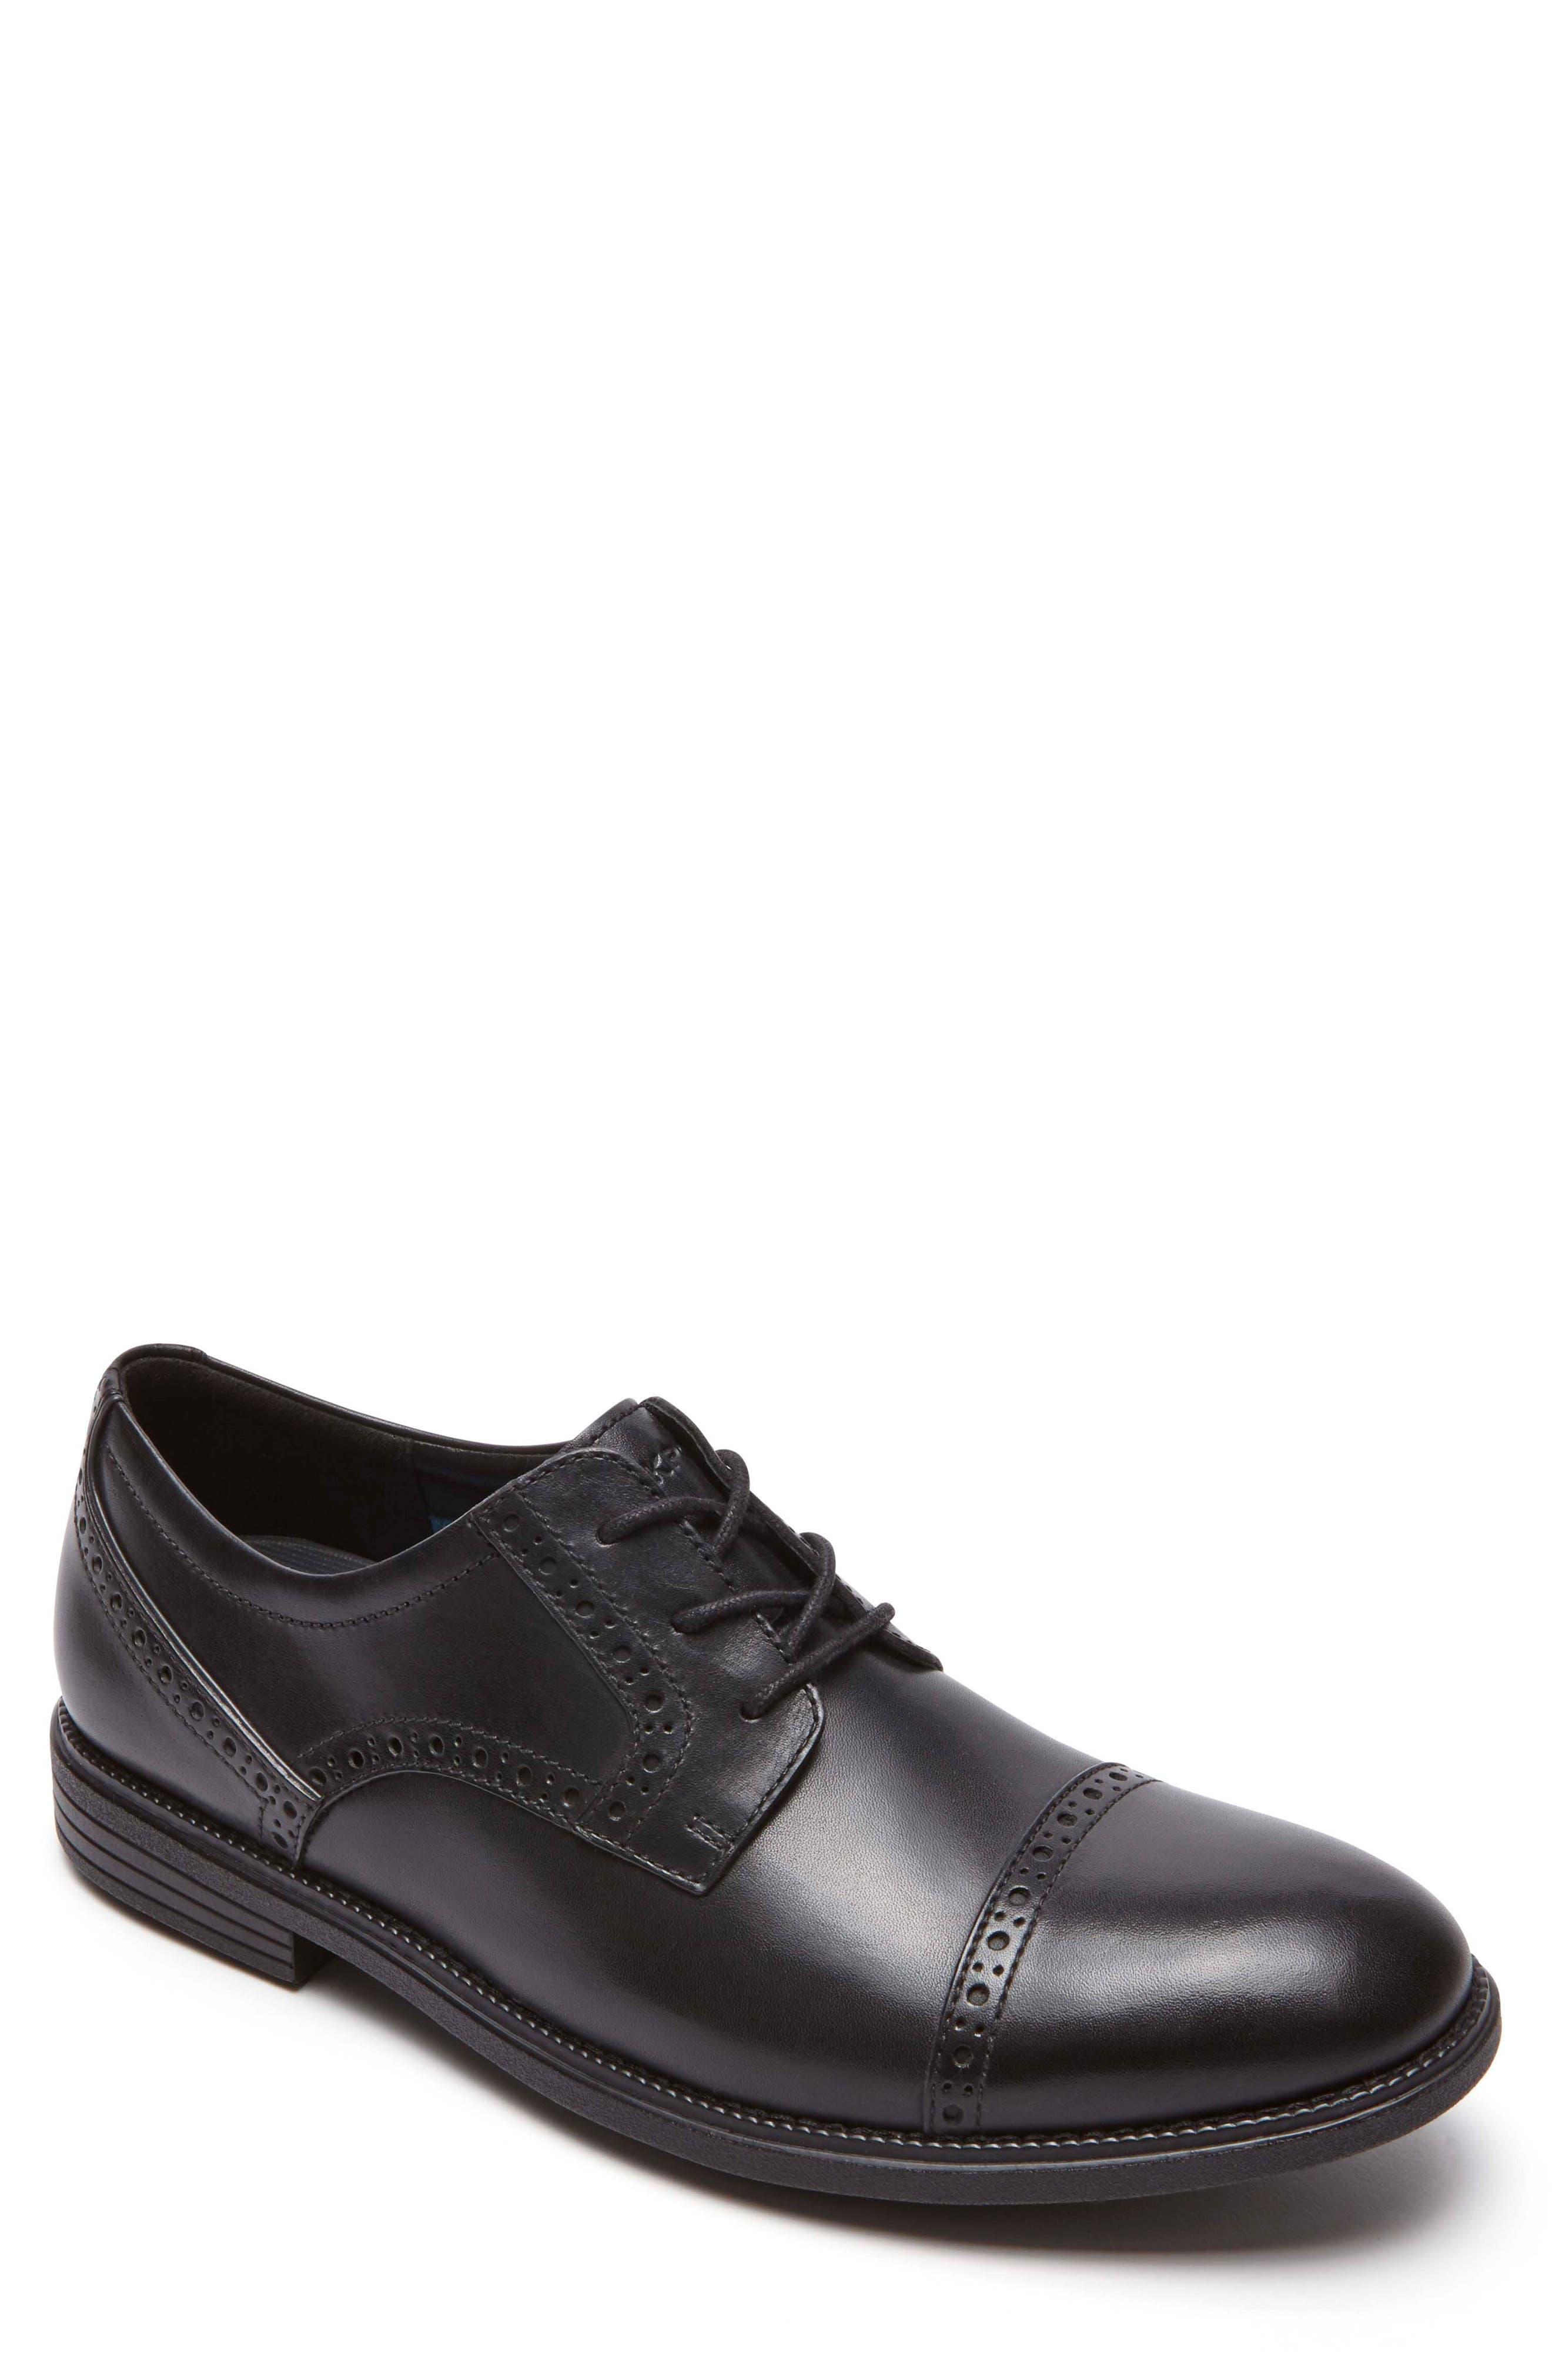 Madson Cap Toe Derby,                             Main thumbnail 1, color,                             Black Leather